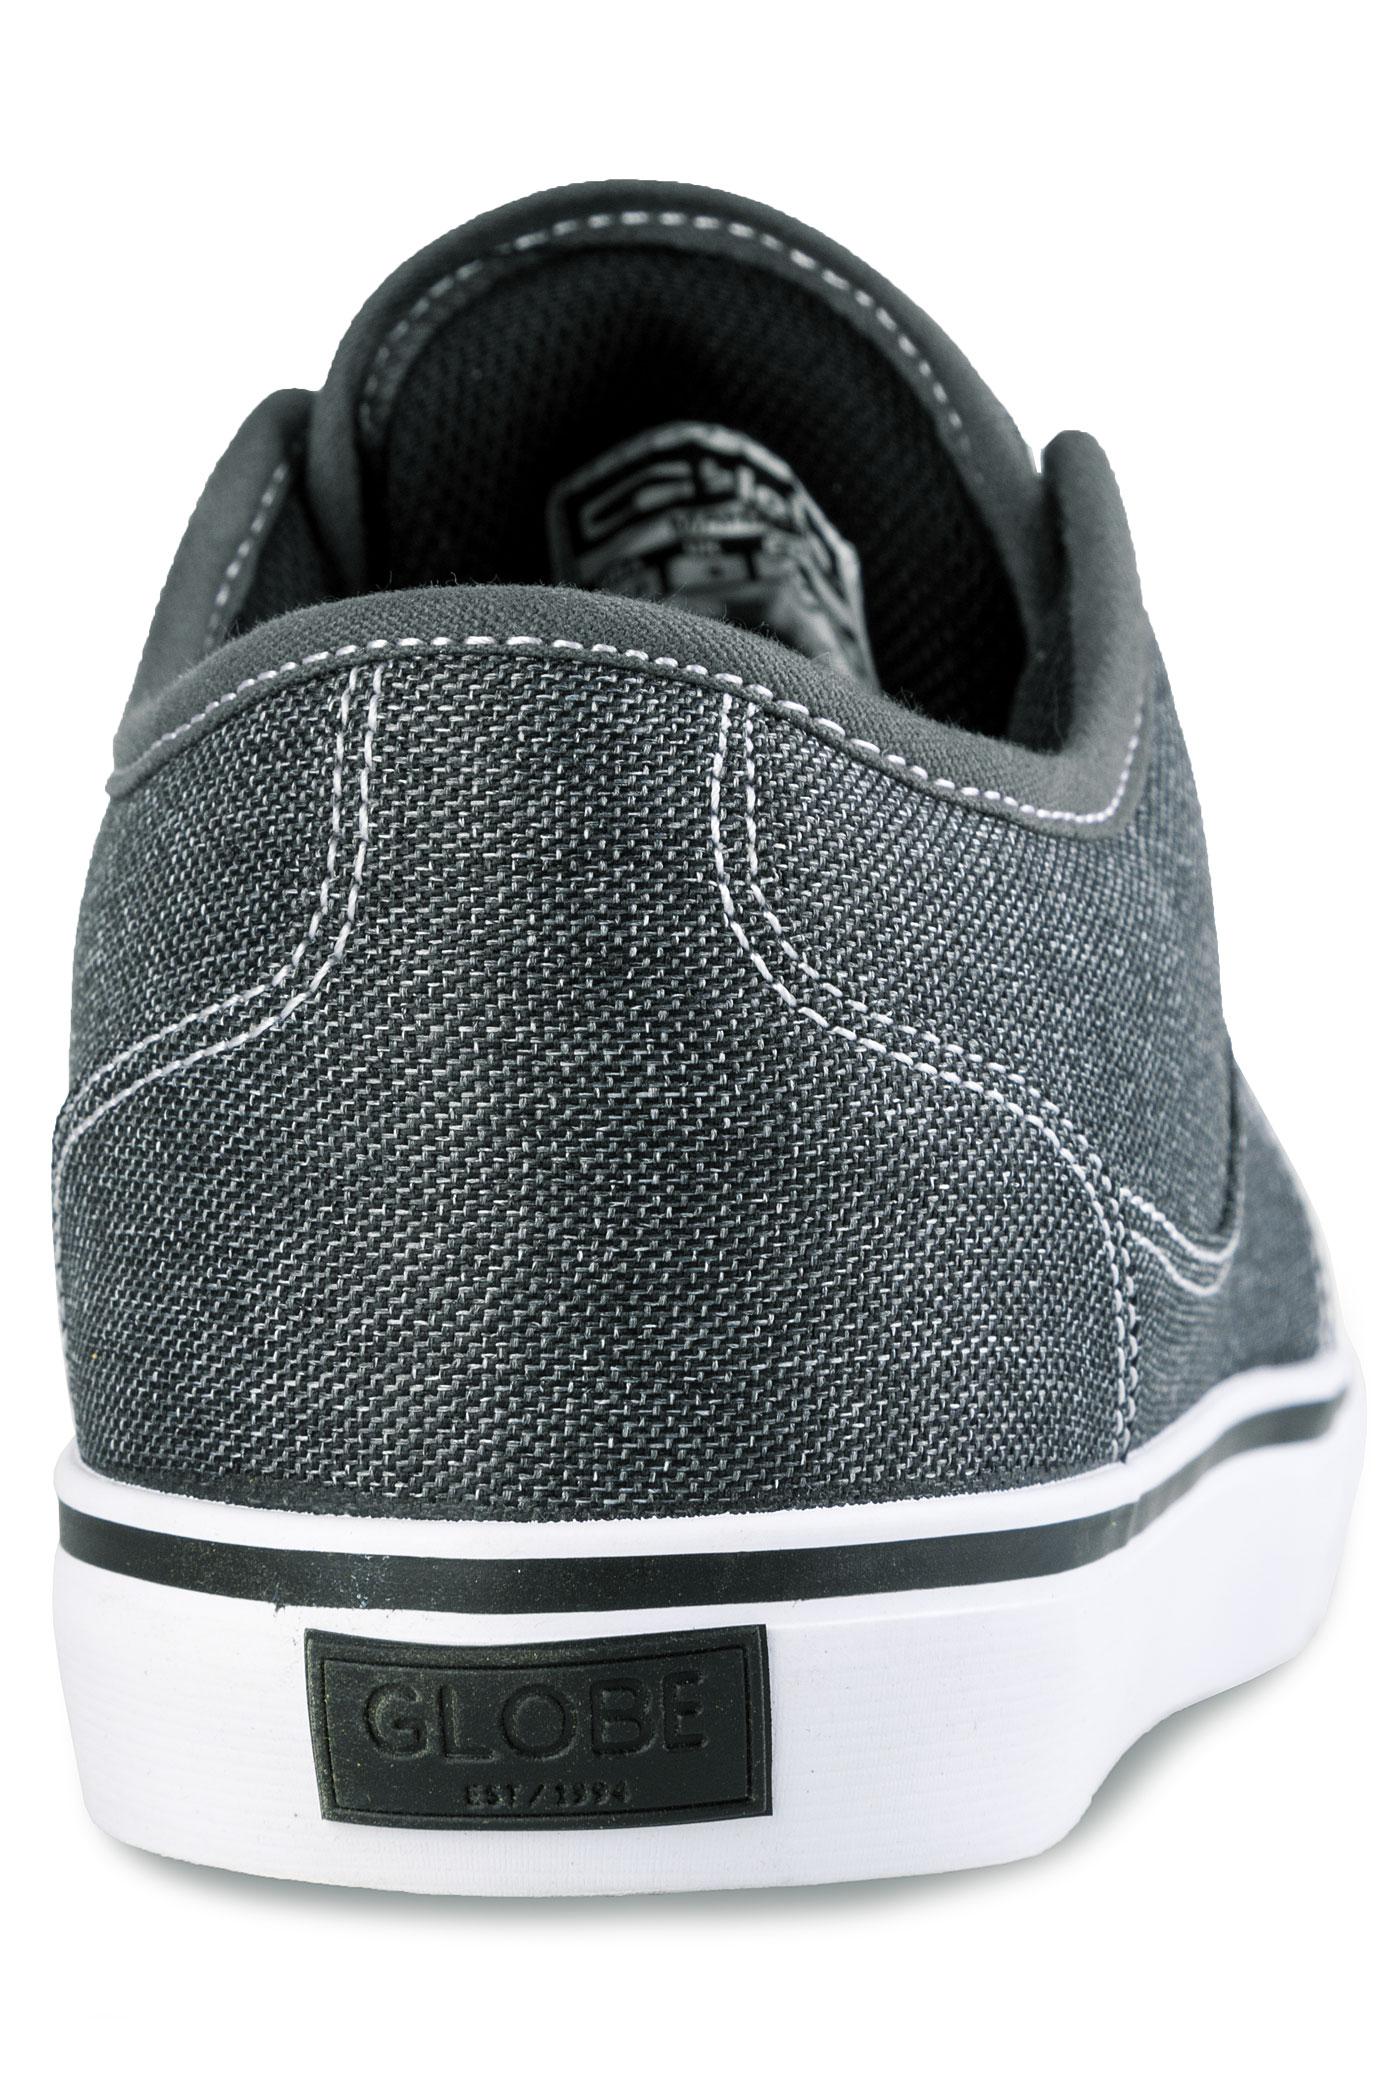 globe mahalo chaussure black chambray achetez sur skatedeluxe. Black Bedroom Furniture Sets. Home Design Ideas